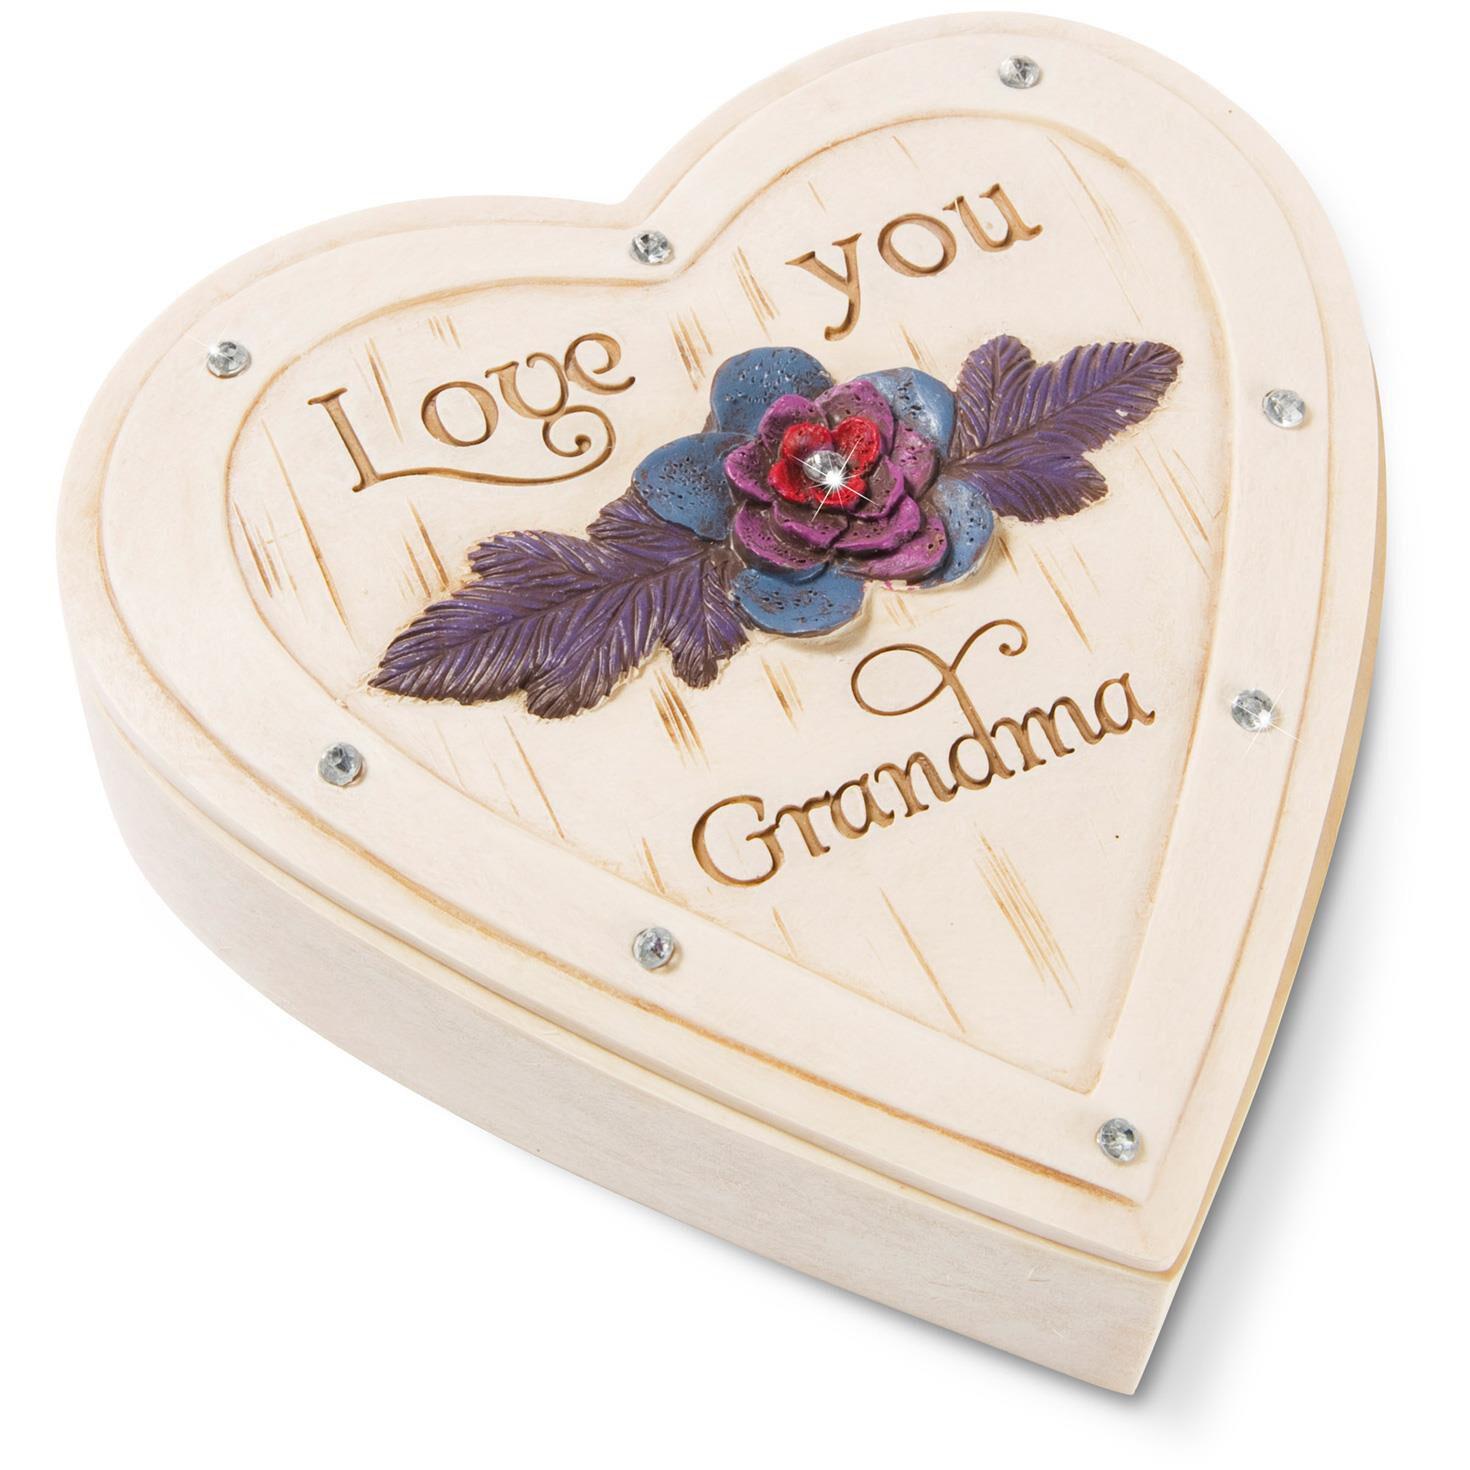 Love You Grandma Jewelry Box Decorative Accessories Hallmark